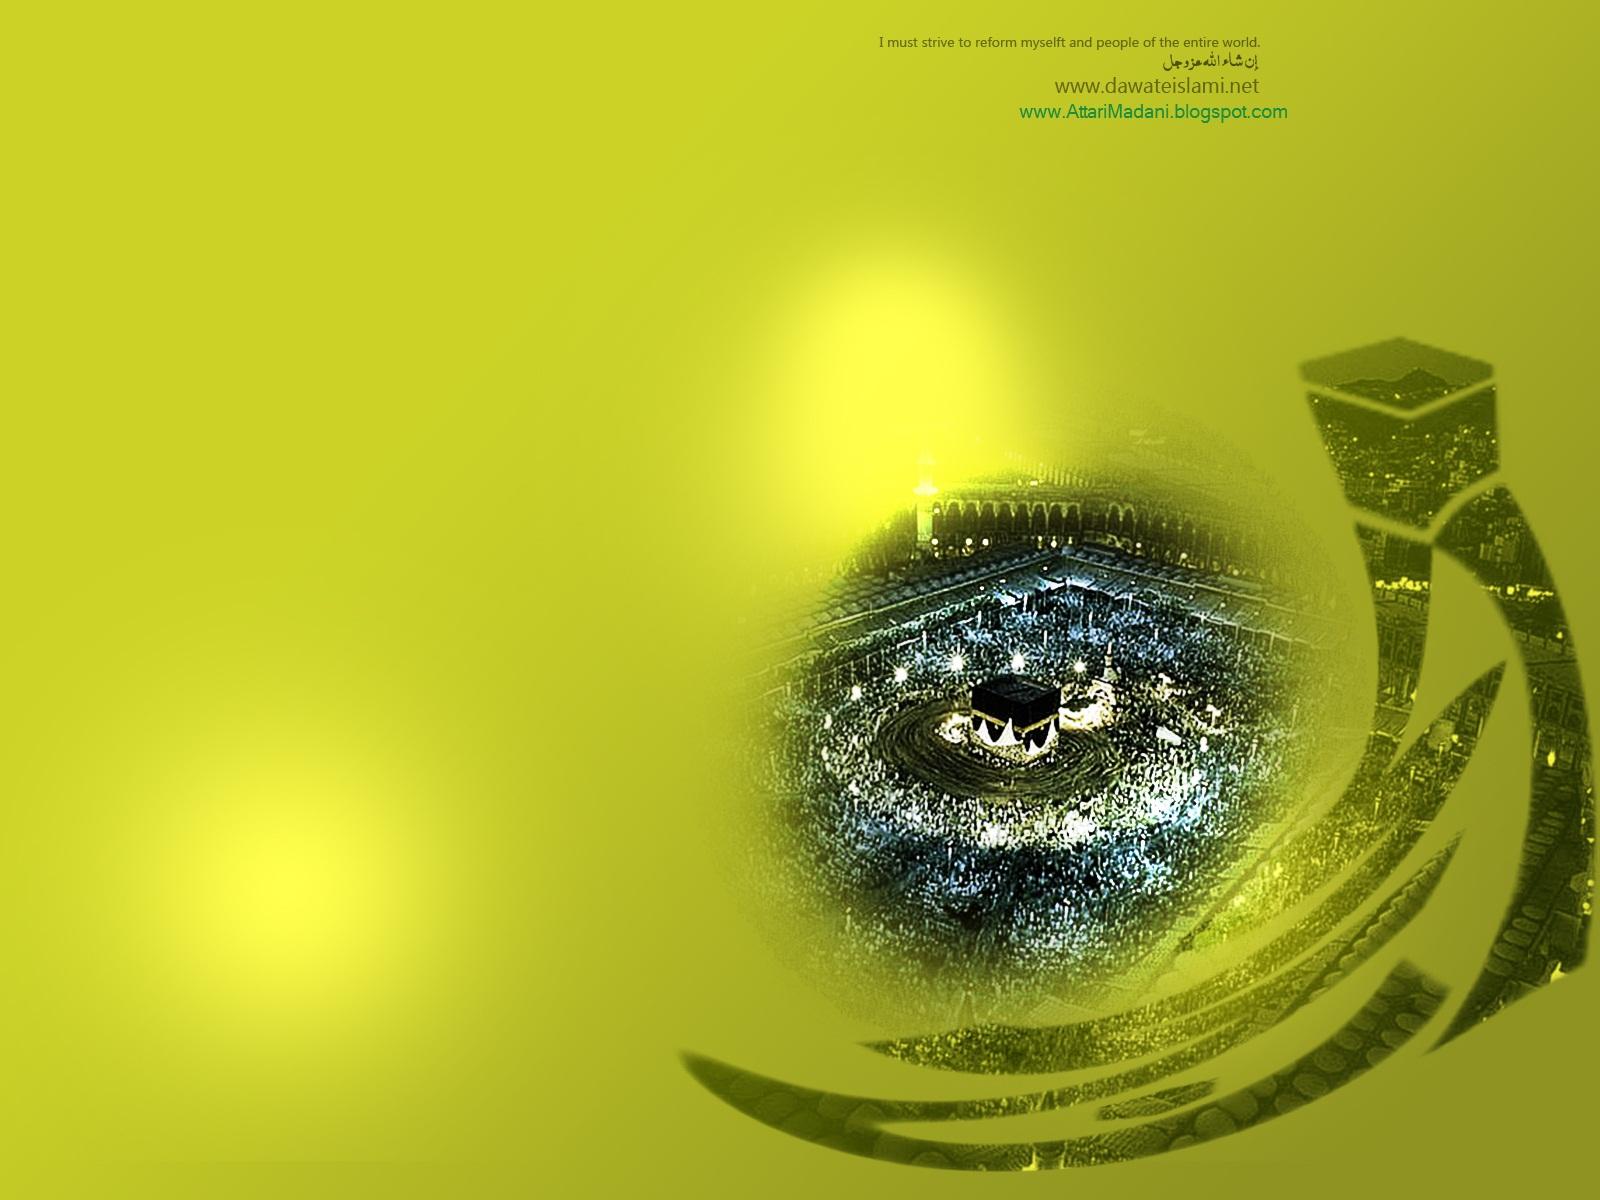 http://3.bp.blogspot.com/-2N8aeBpR6e8/ToQVFAFNykI/AAAAAAAAAmE/Q0l8zn-BD9c/s1600/Hajj-And-Eid-Adha-Wallpaper-Dawat-e-Islami-15.jpg